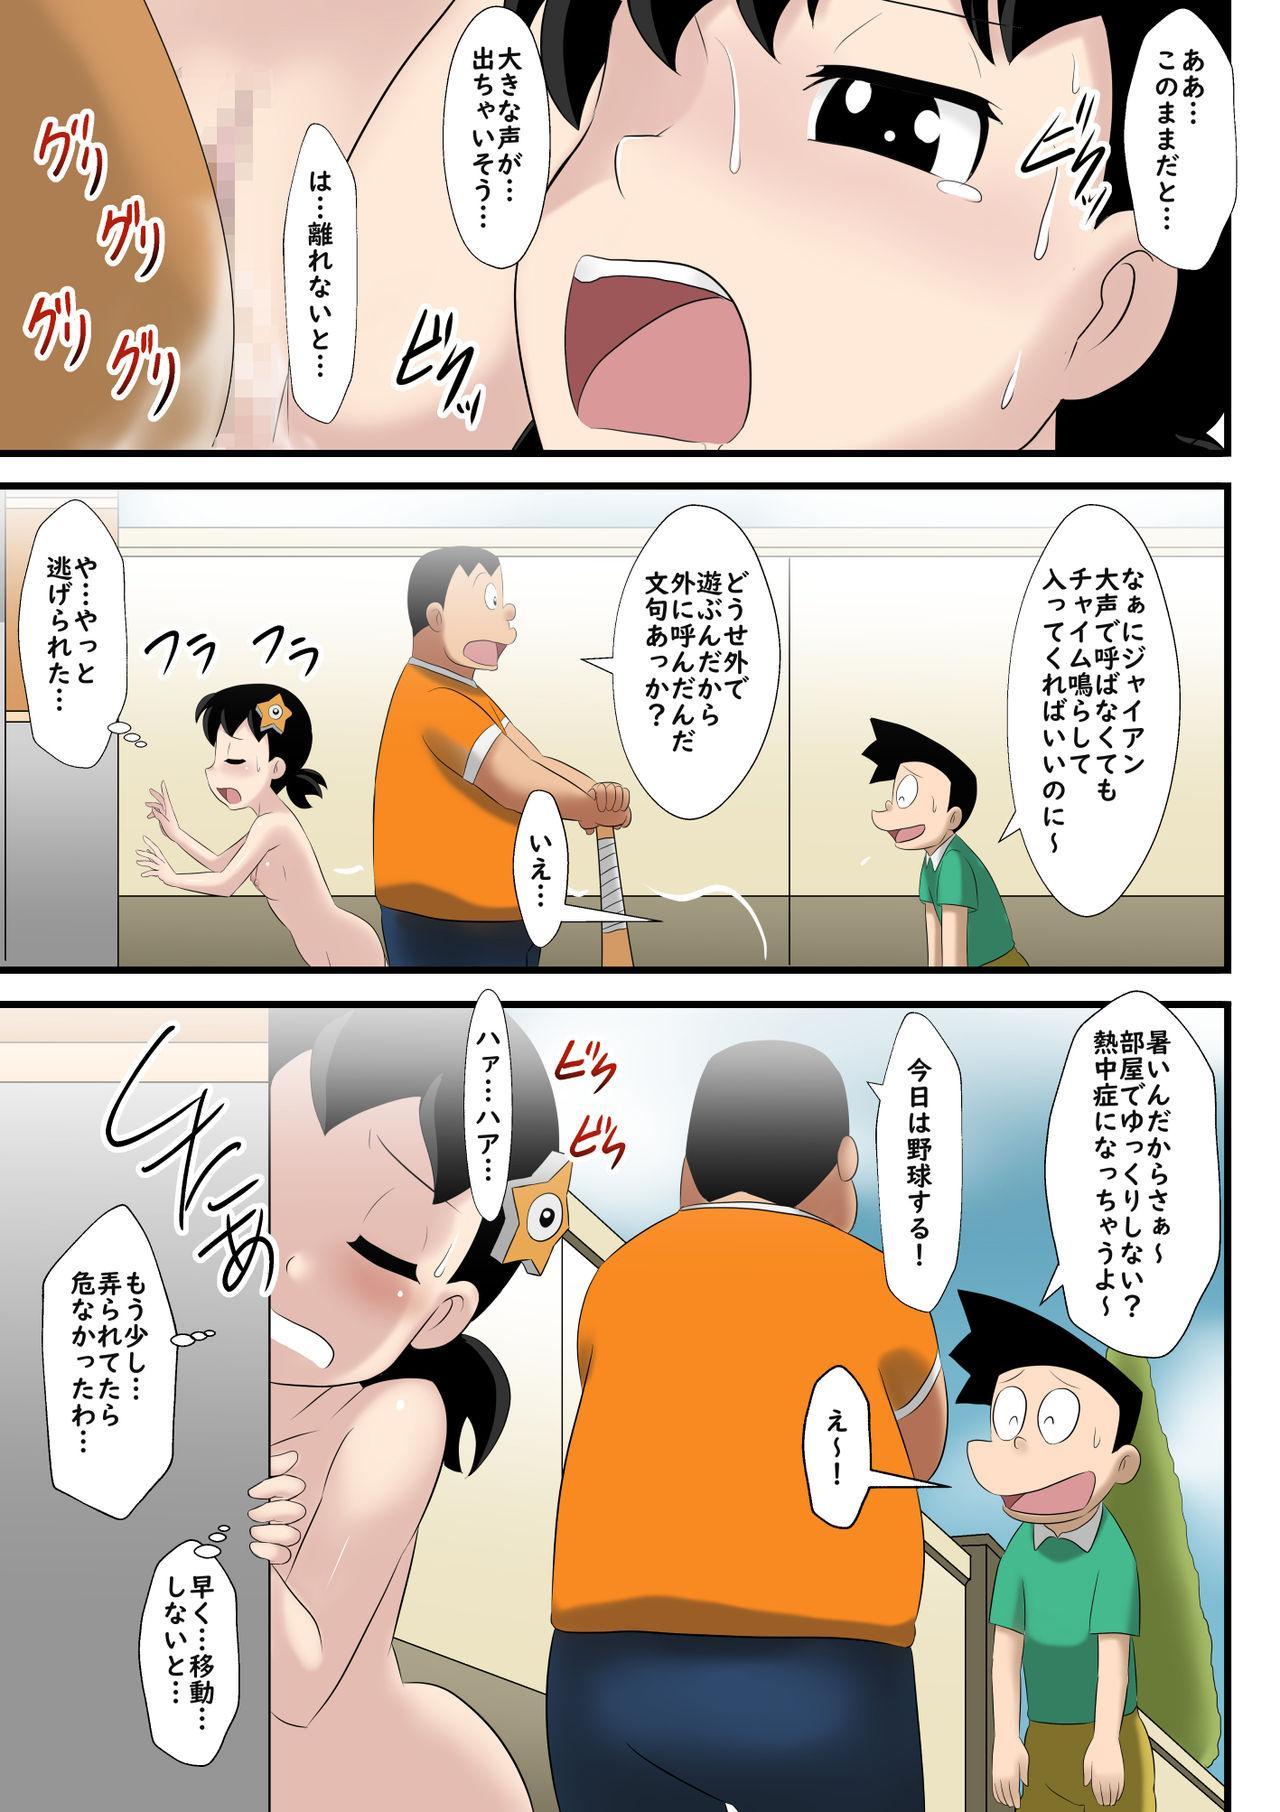 [Circle Takaya] if -sizuka- 3 (Doraemon) 13